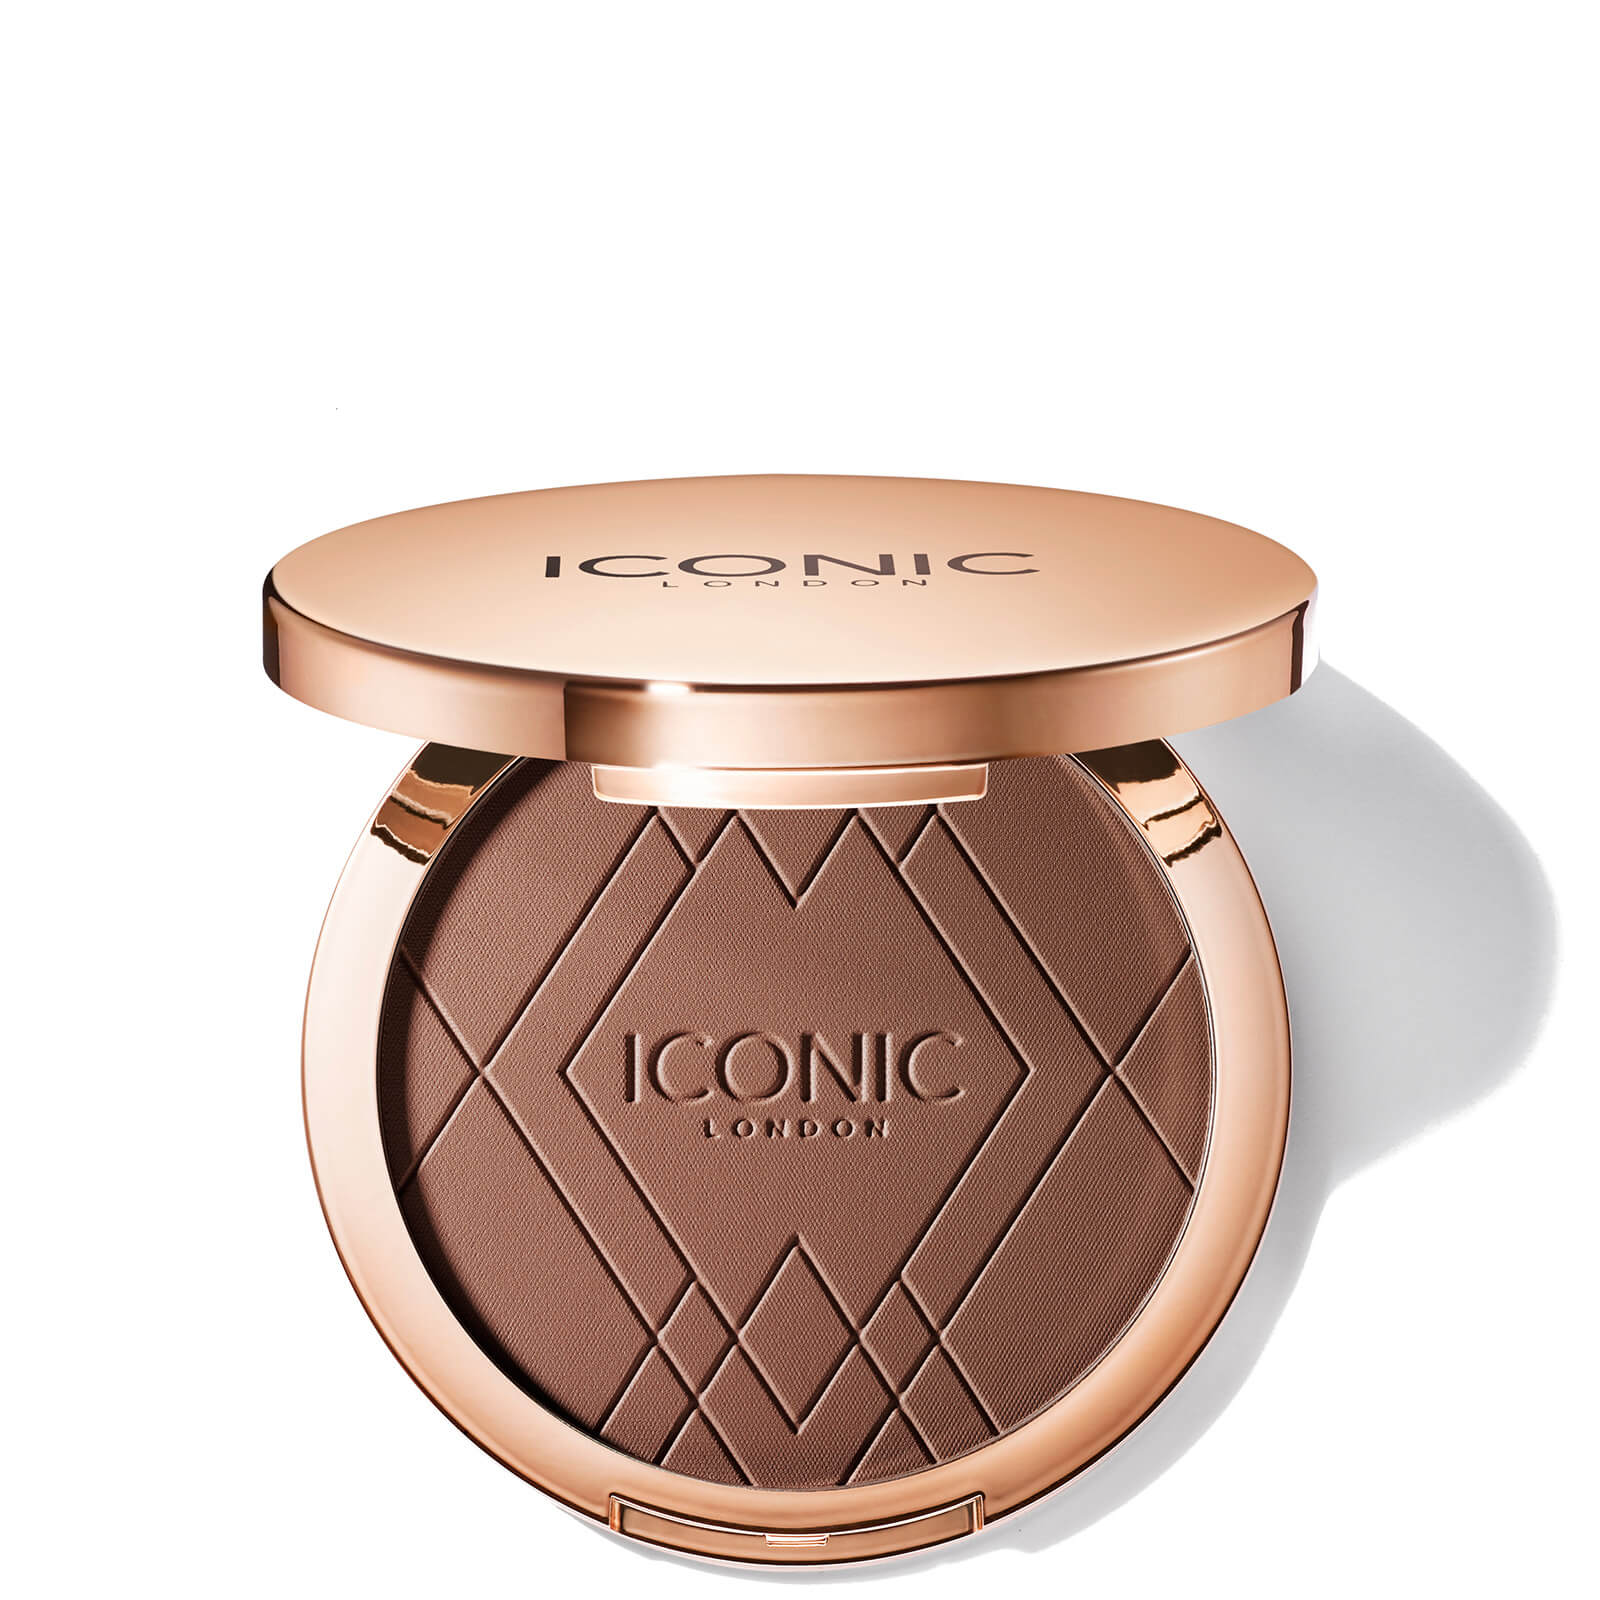 Купить ICONIC London Ultimate Bronzing Powder 17g (Various Shades) - Rich Bronze